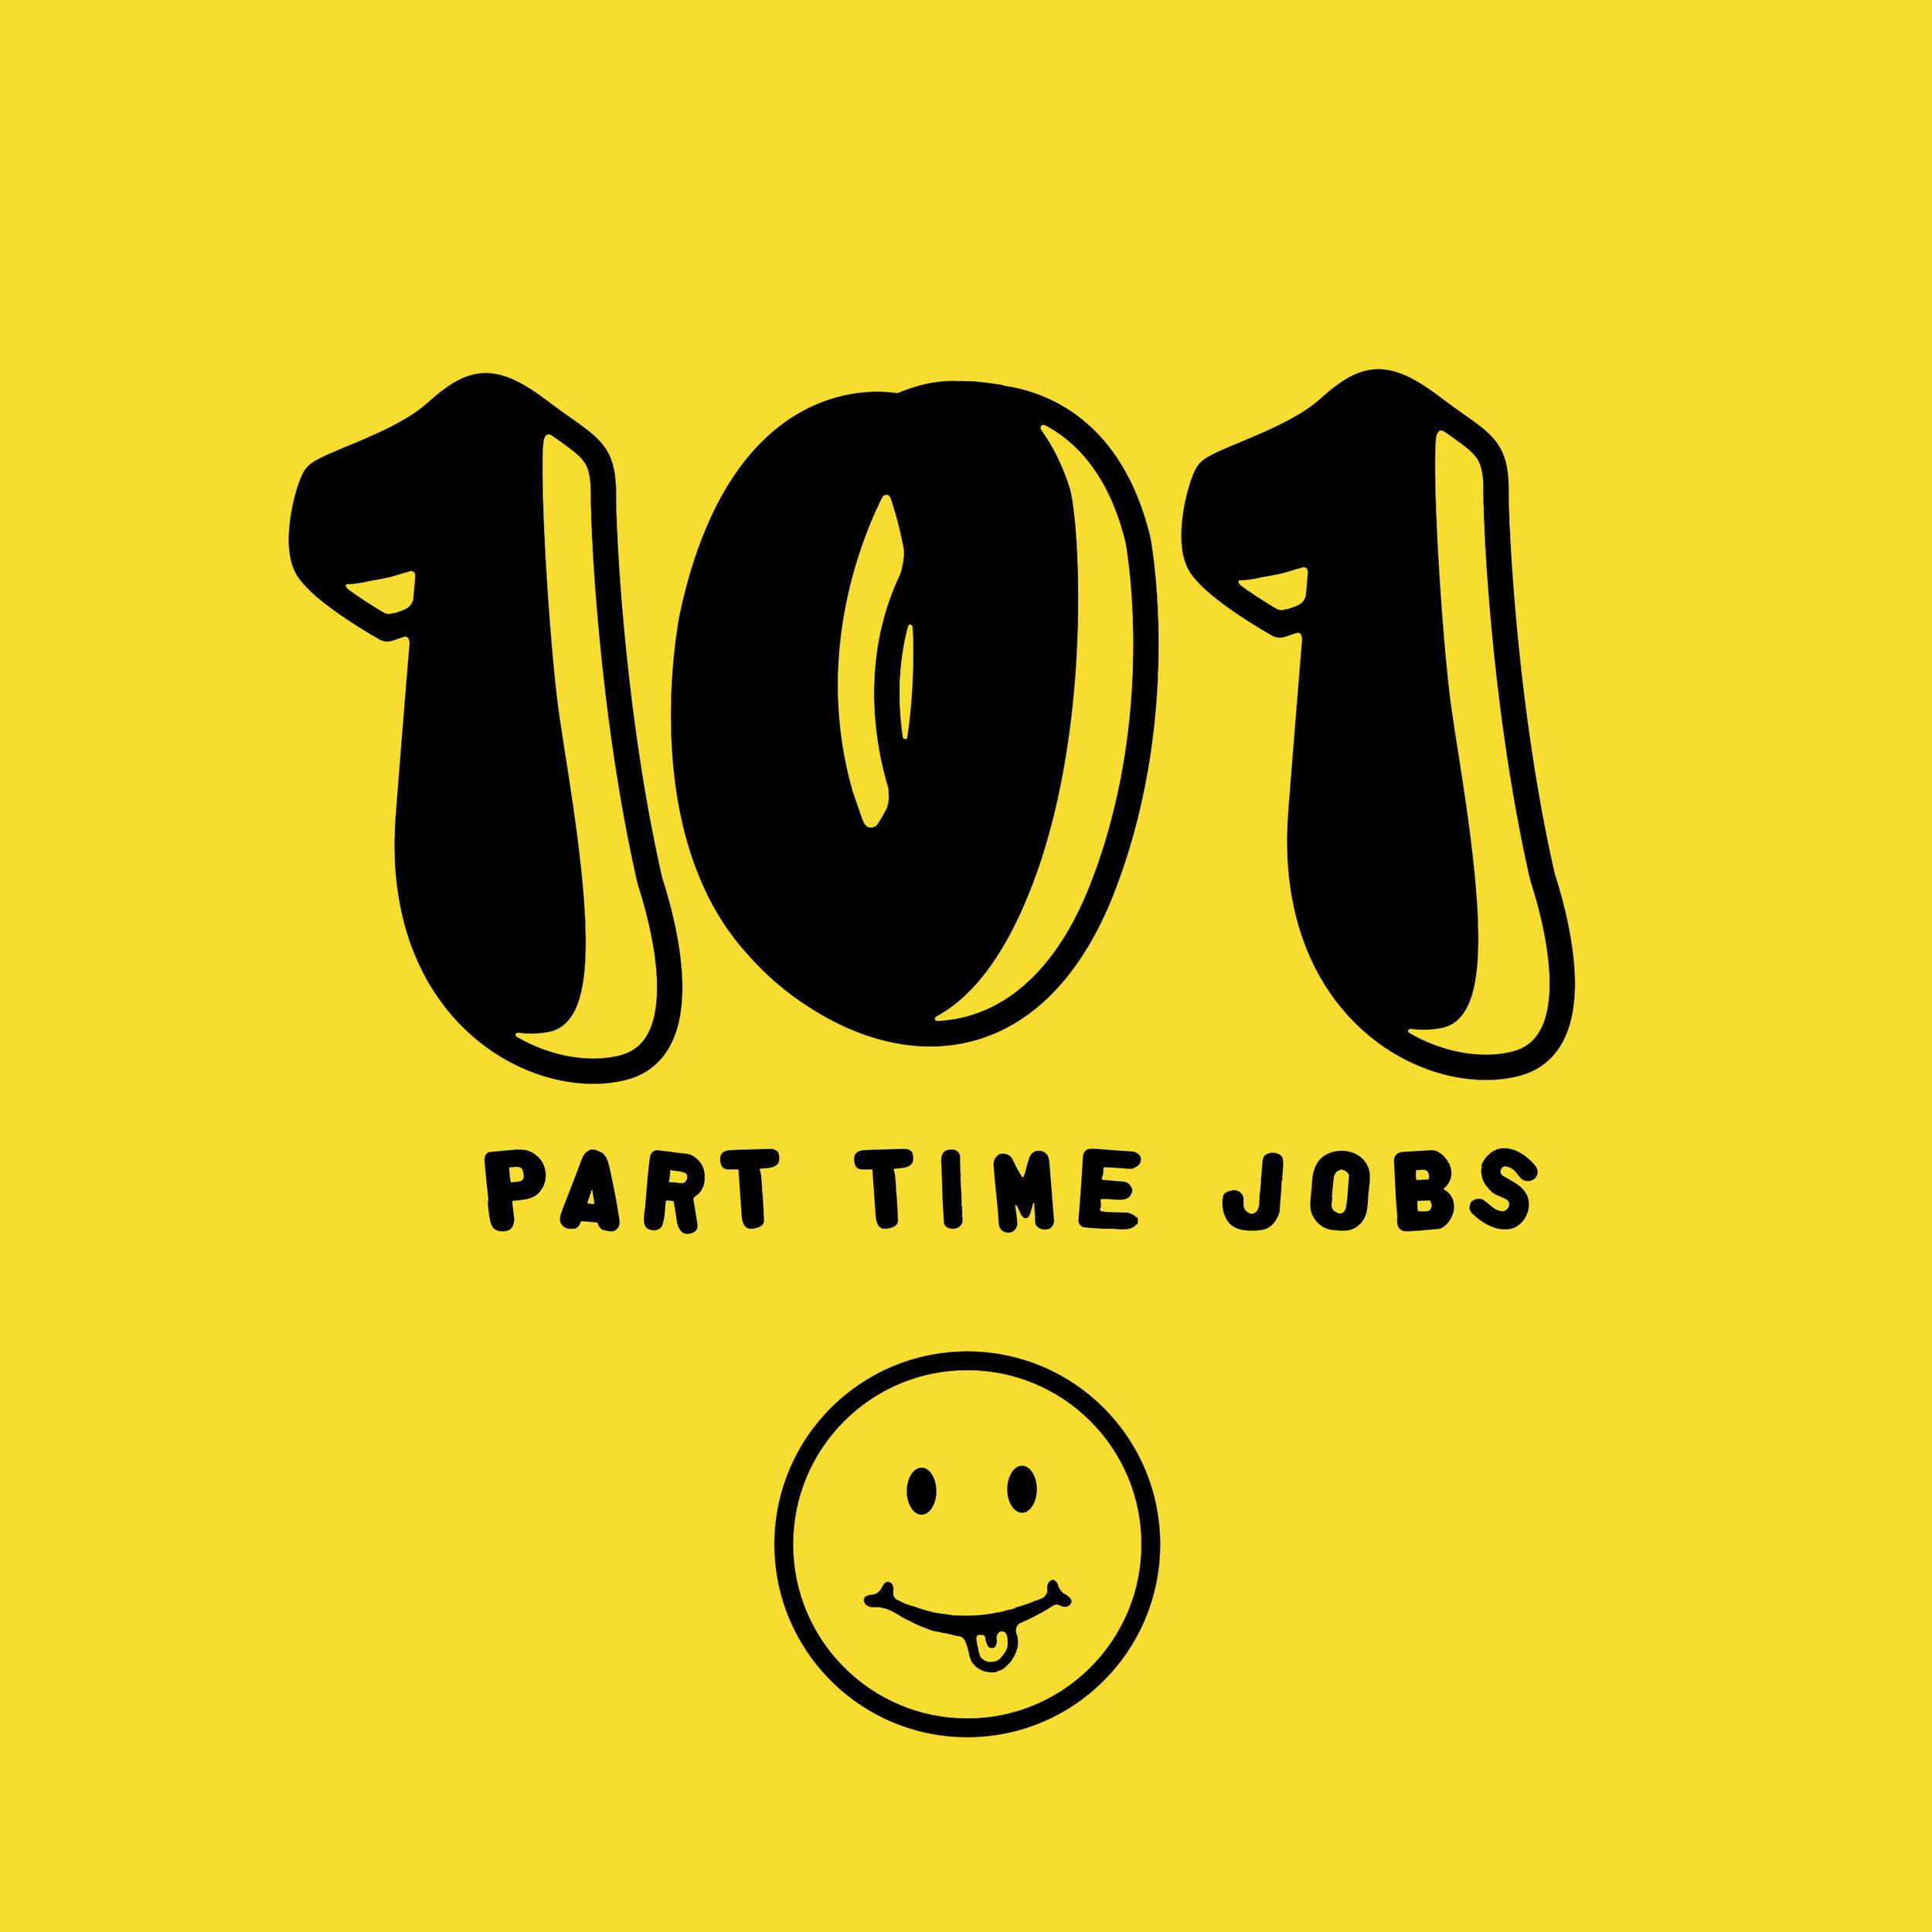 101 Part Time Jobs 1.jpg